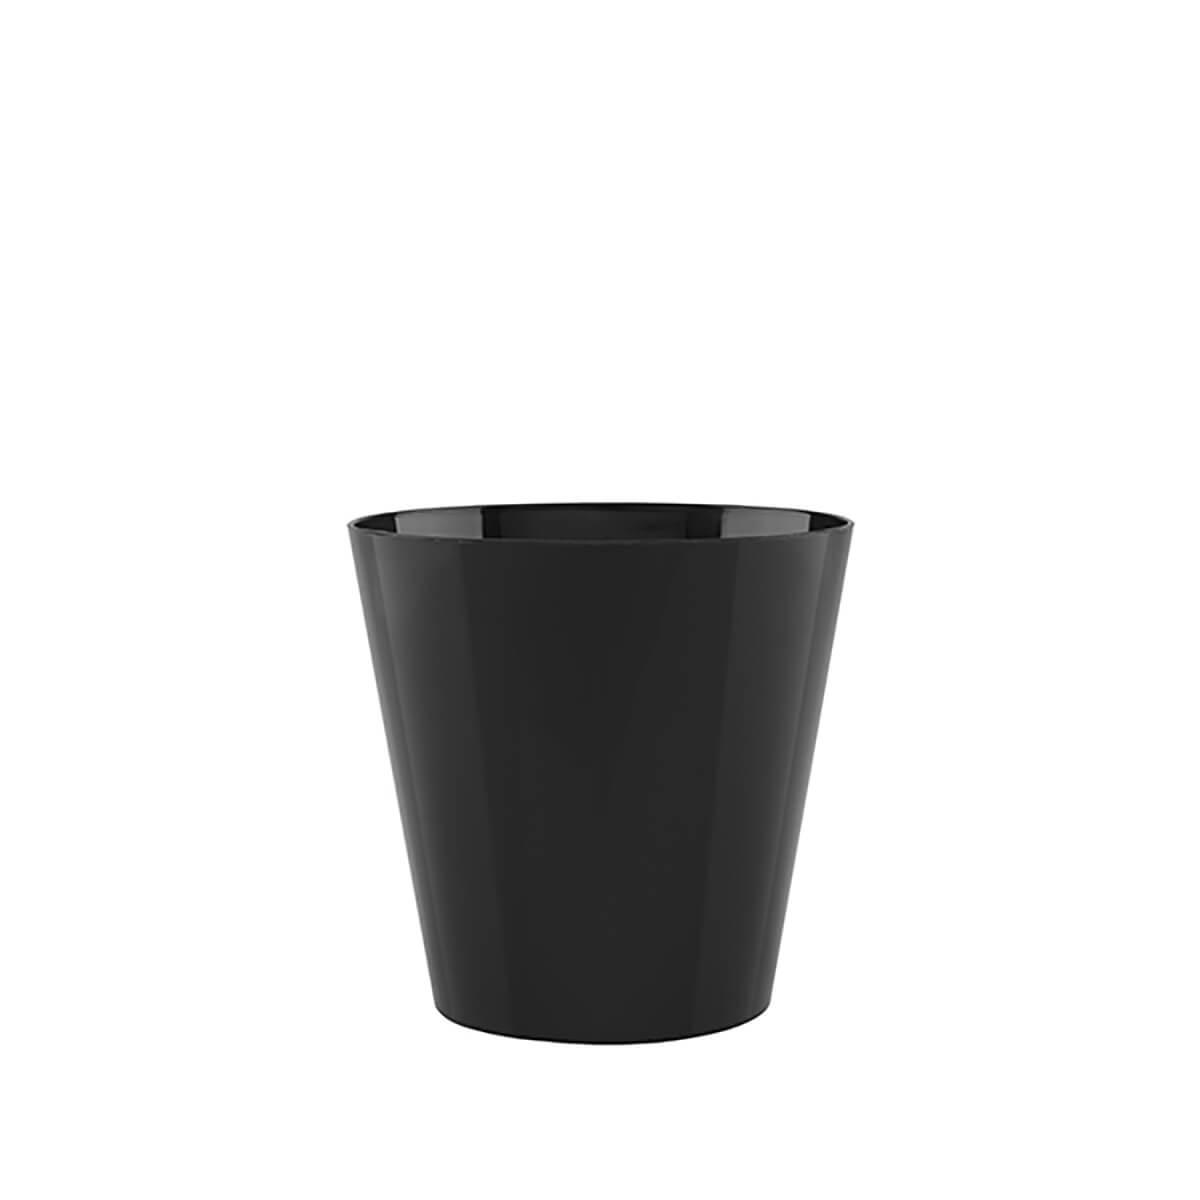 Vaso Porto 18 x 16 cm Vasart